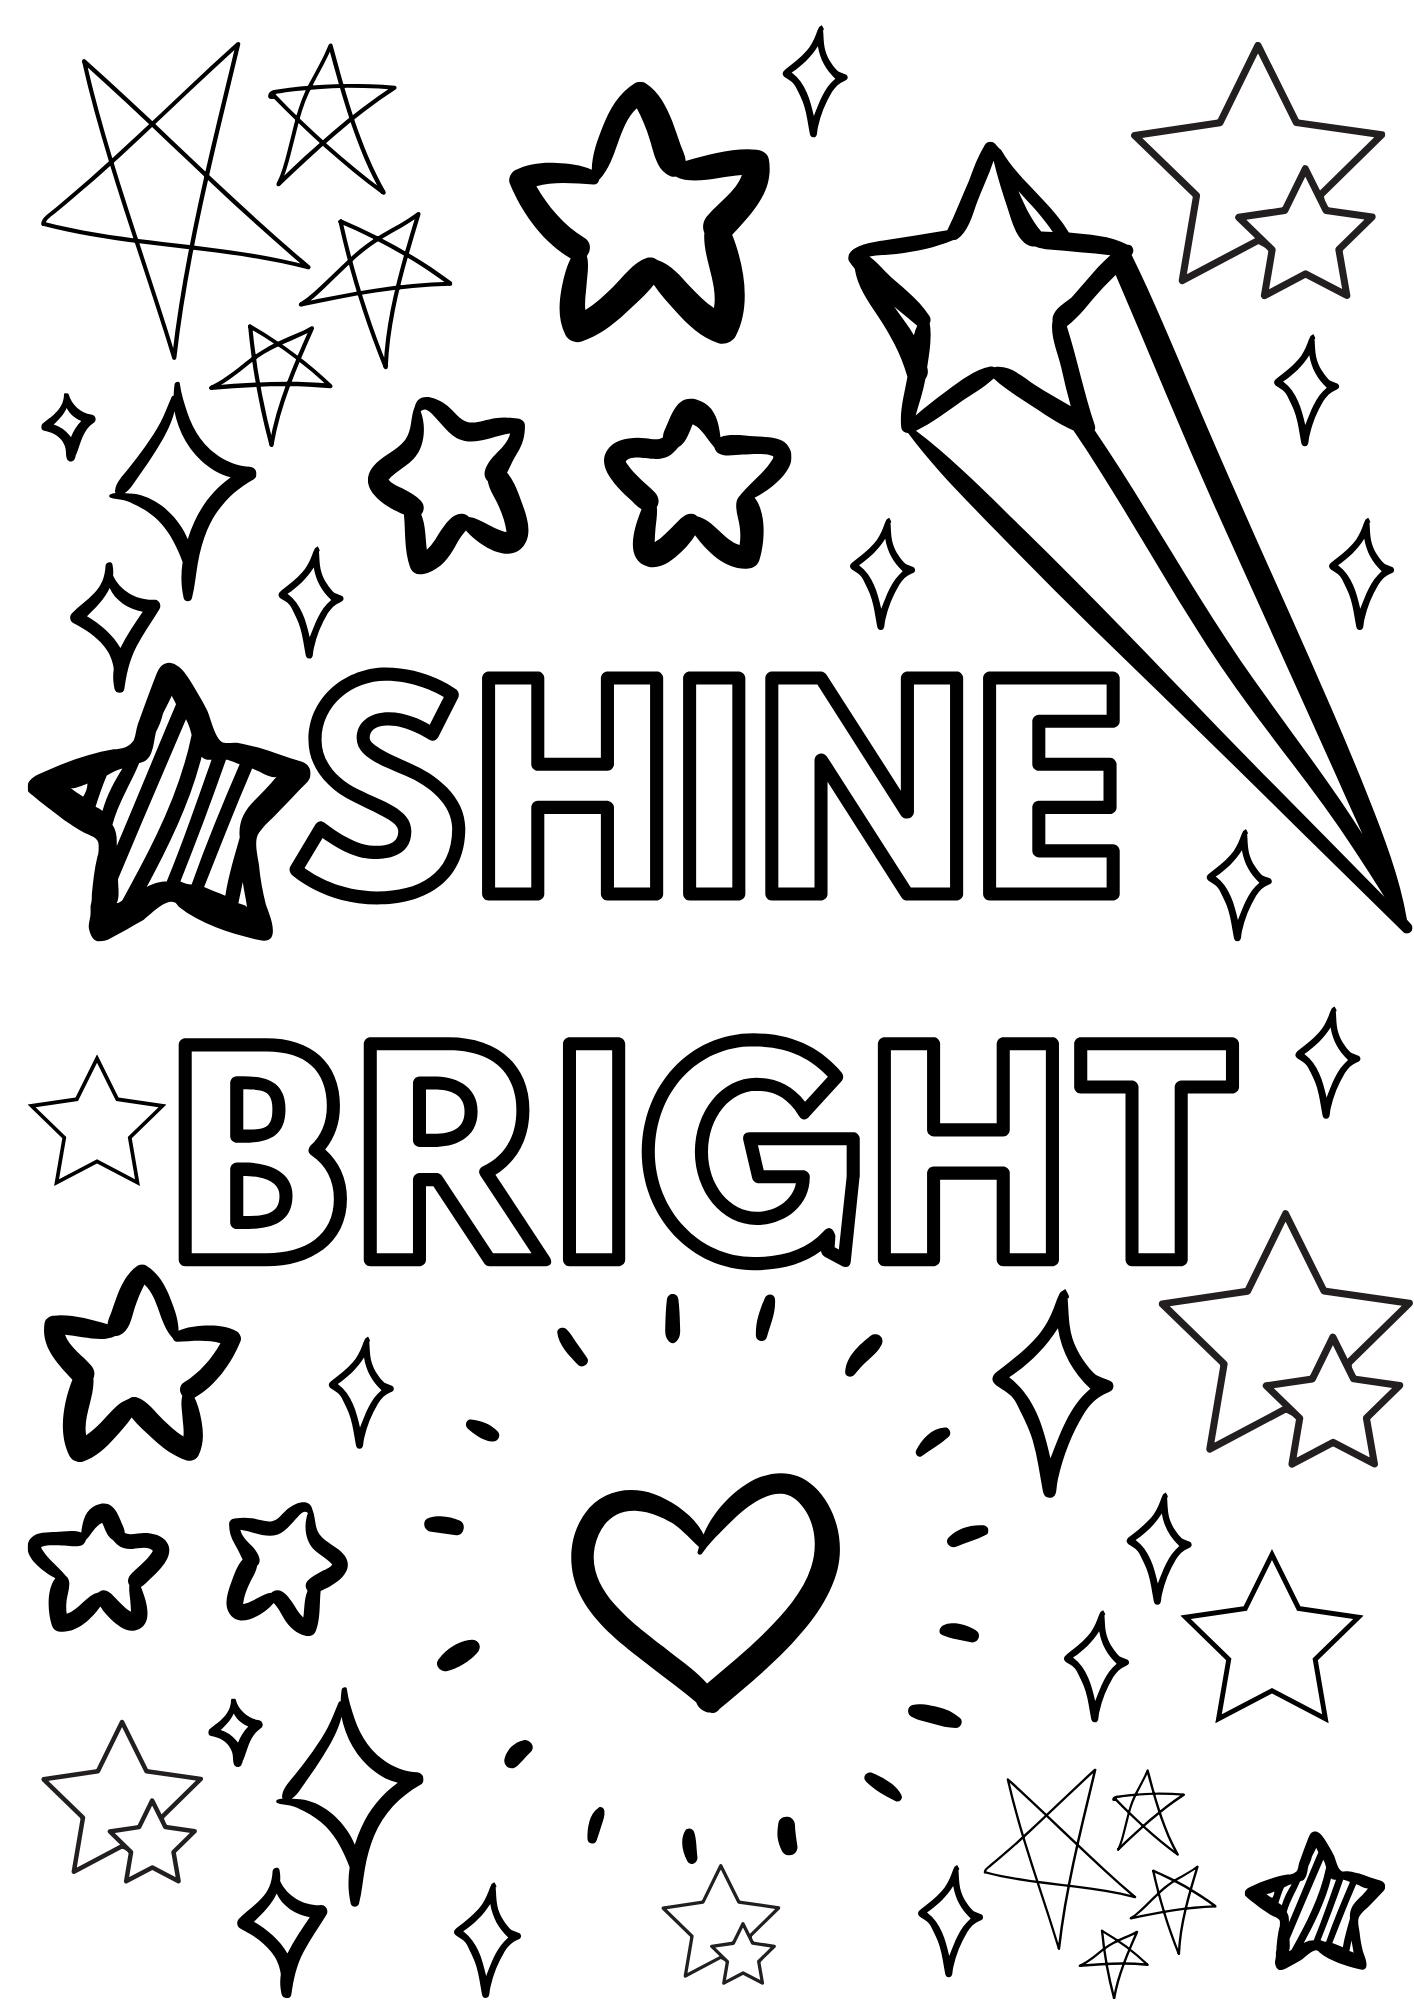 Shine Bright coloring page stars